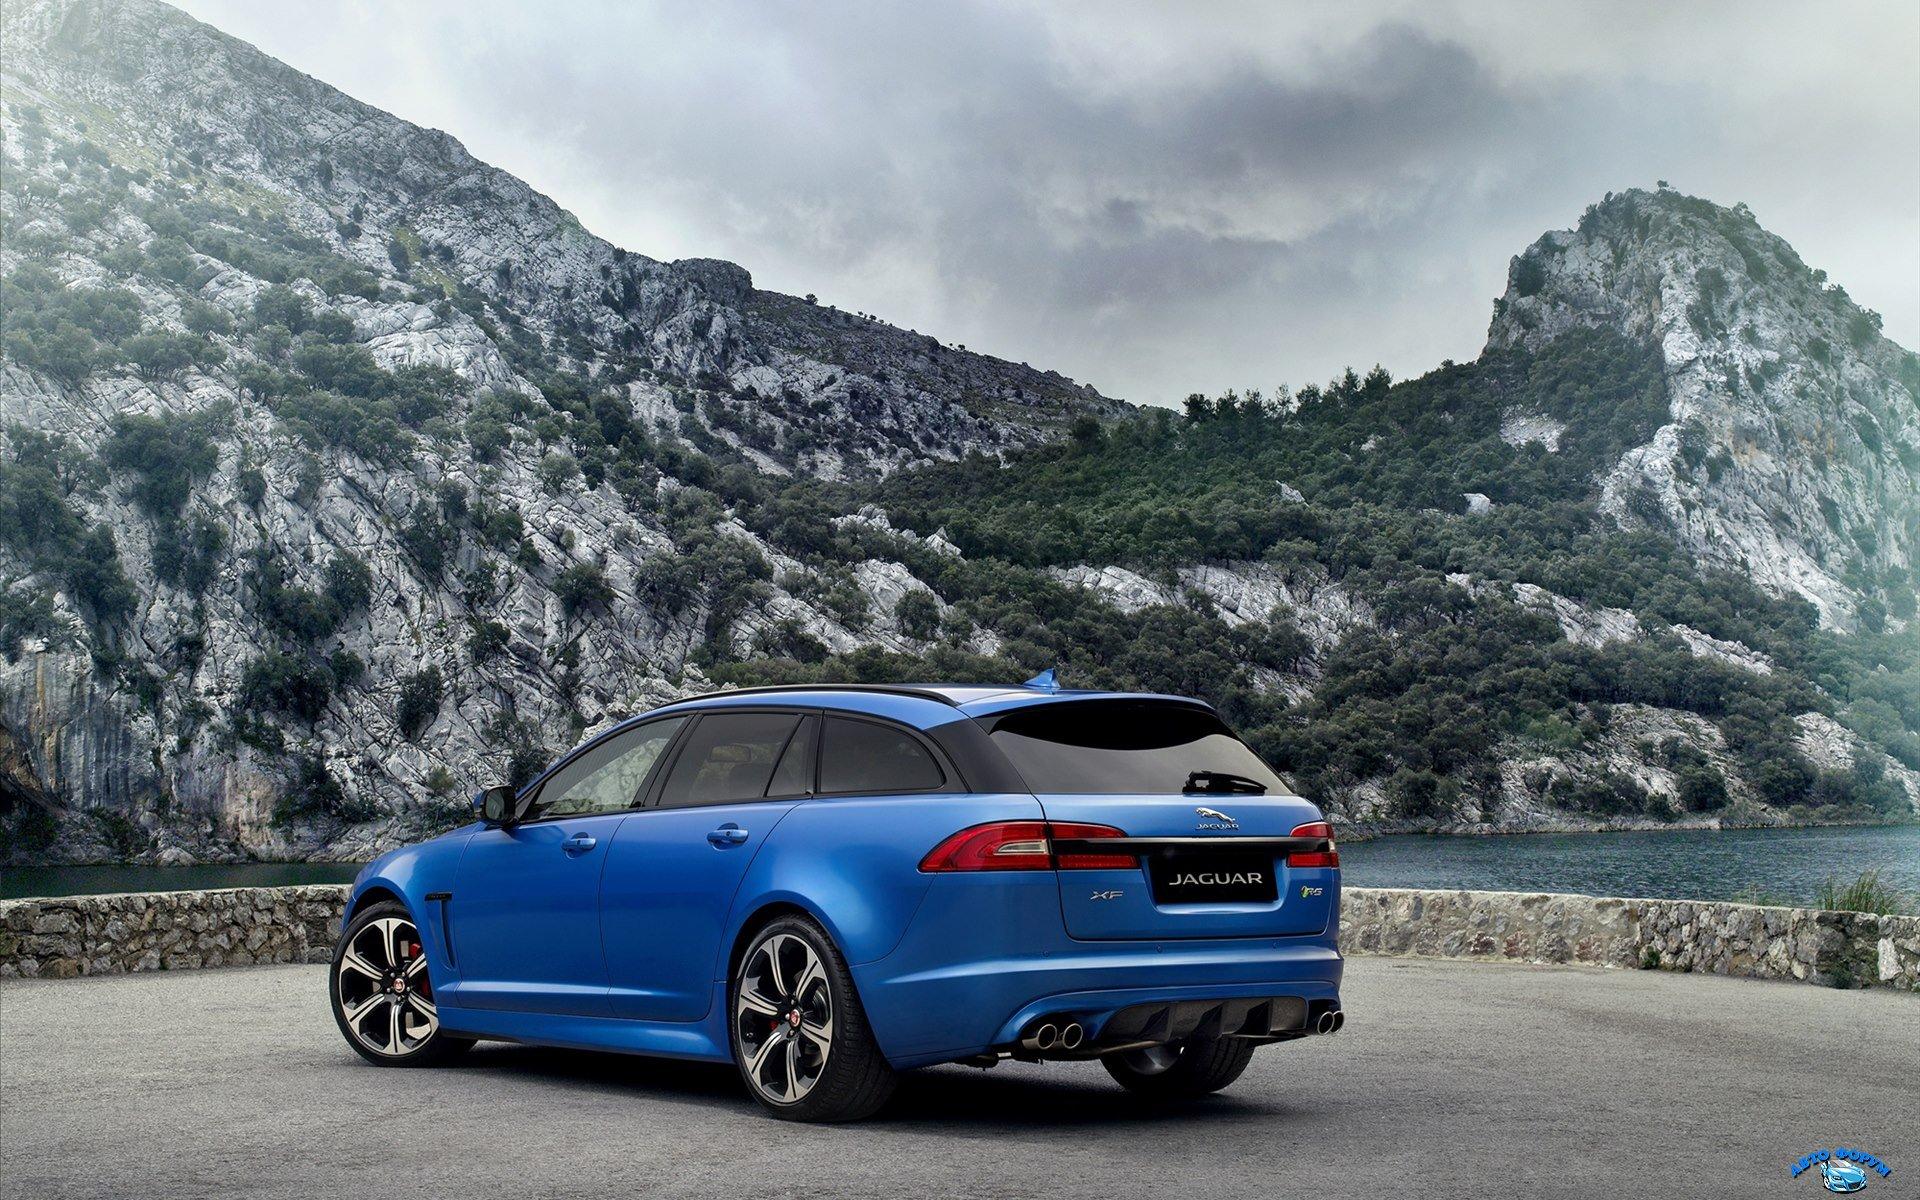 Jaguar-XFR-S-Sportbrake-2015-widescreen-26.jpg